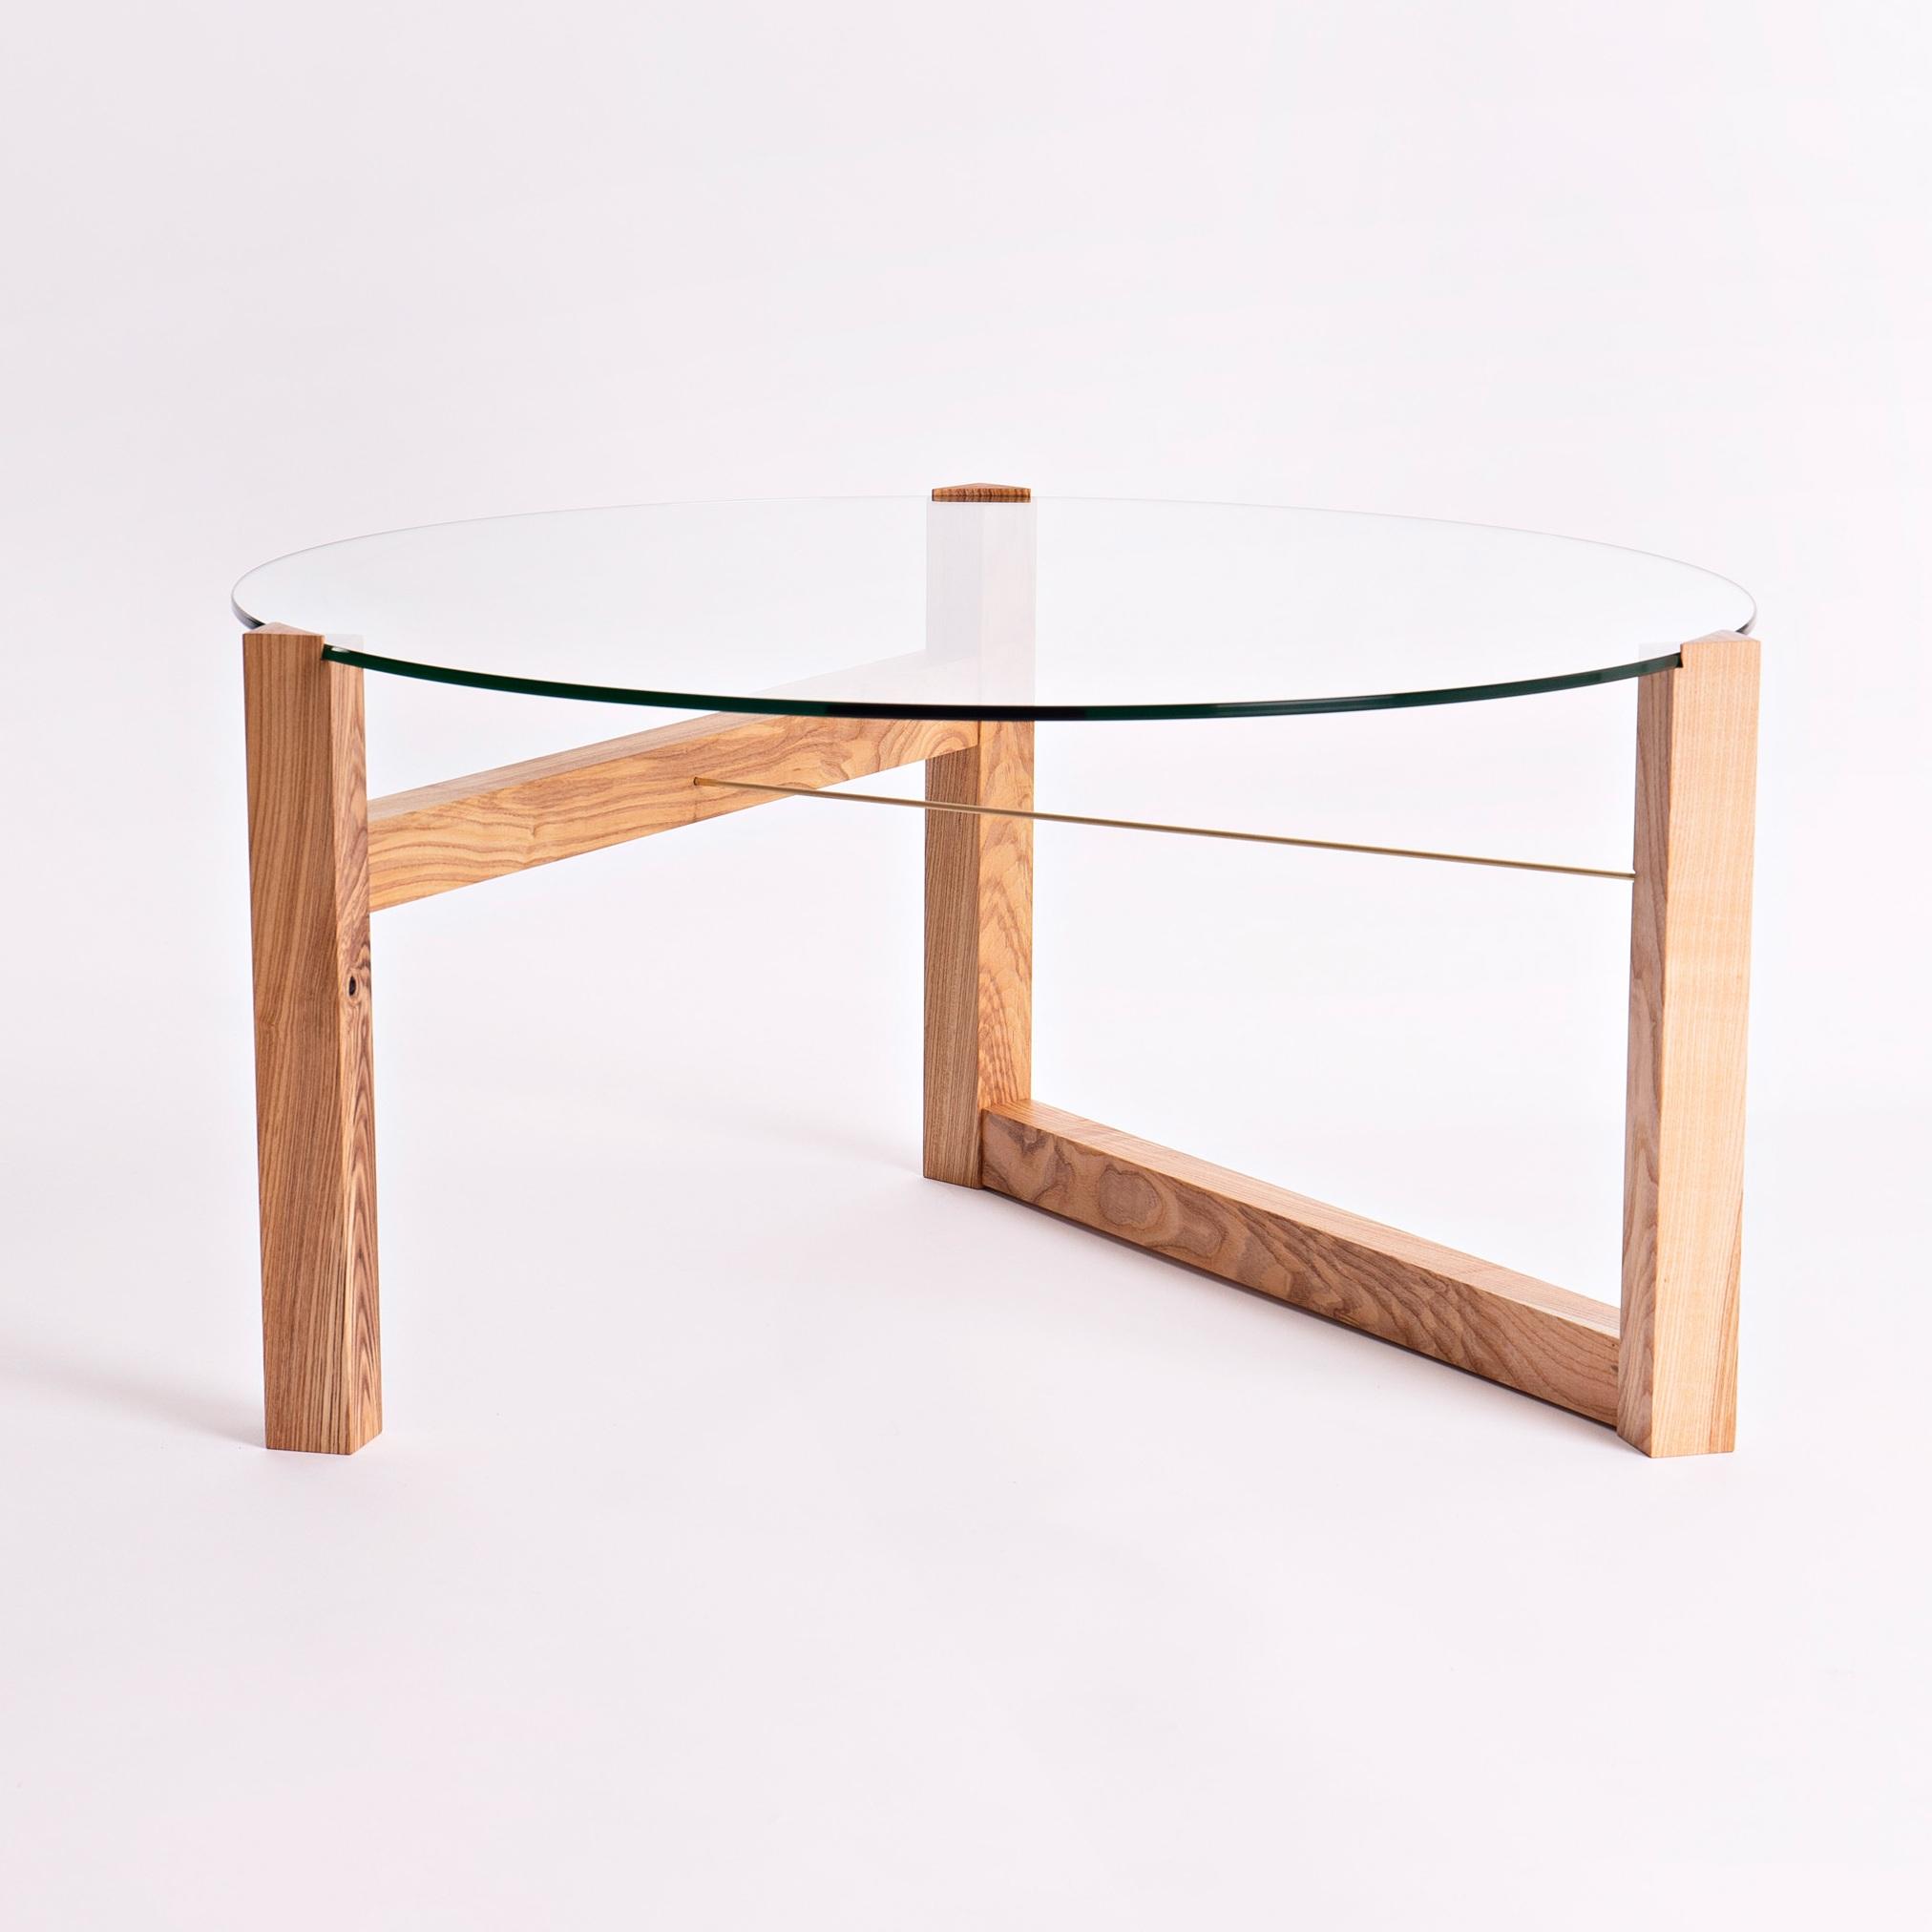 trigonon-low-table1_colinharris.jpg